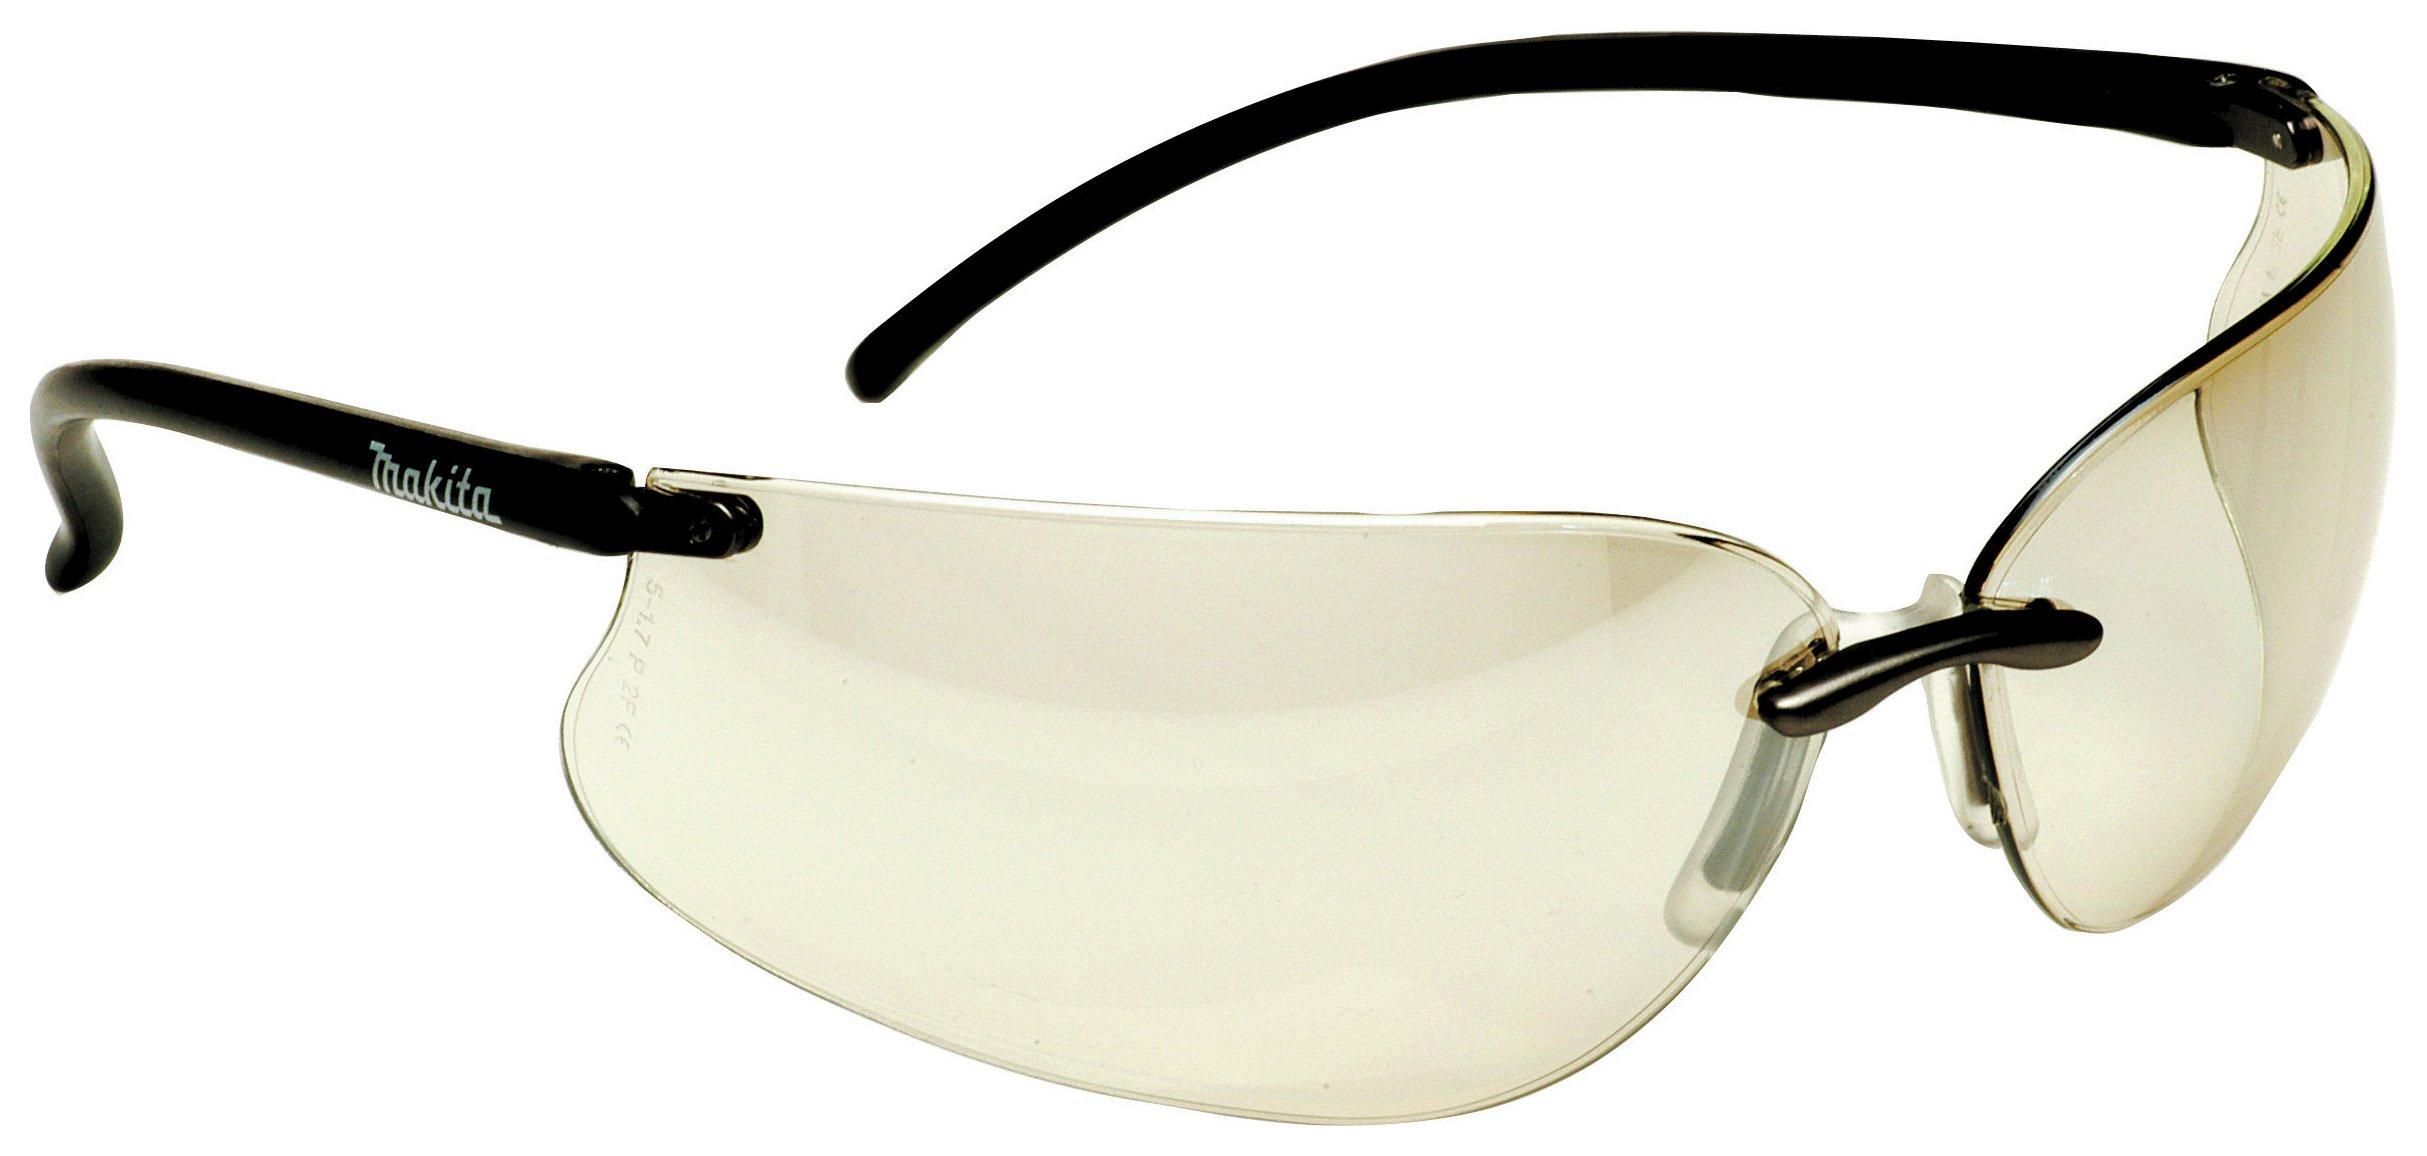 Makita MForce Safety Glasses Kit - Clear